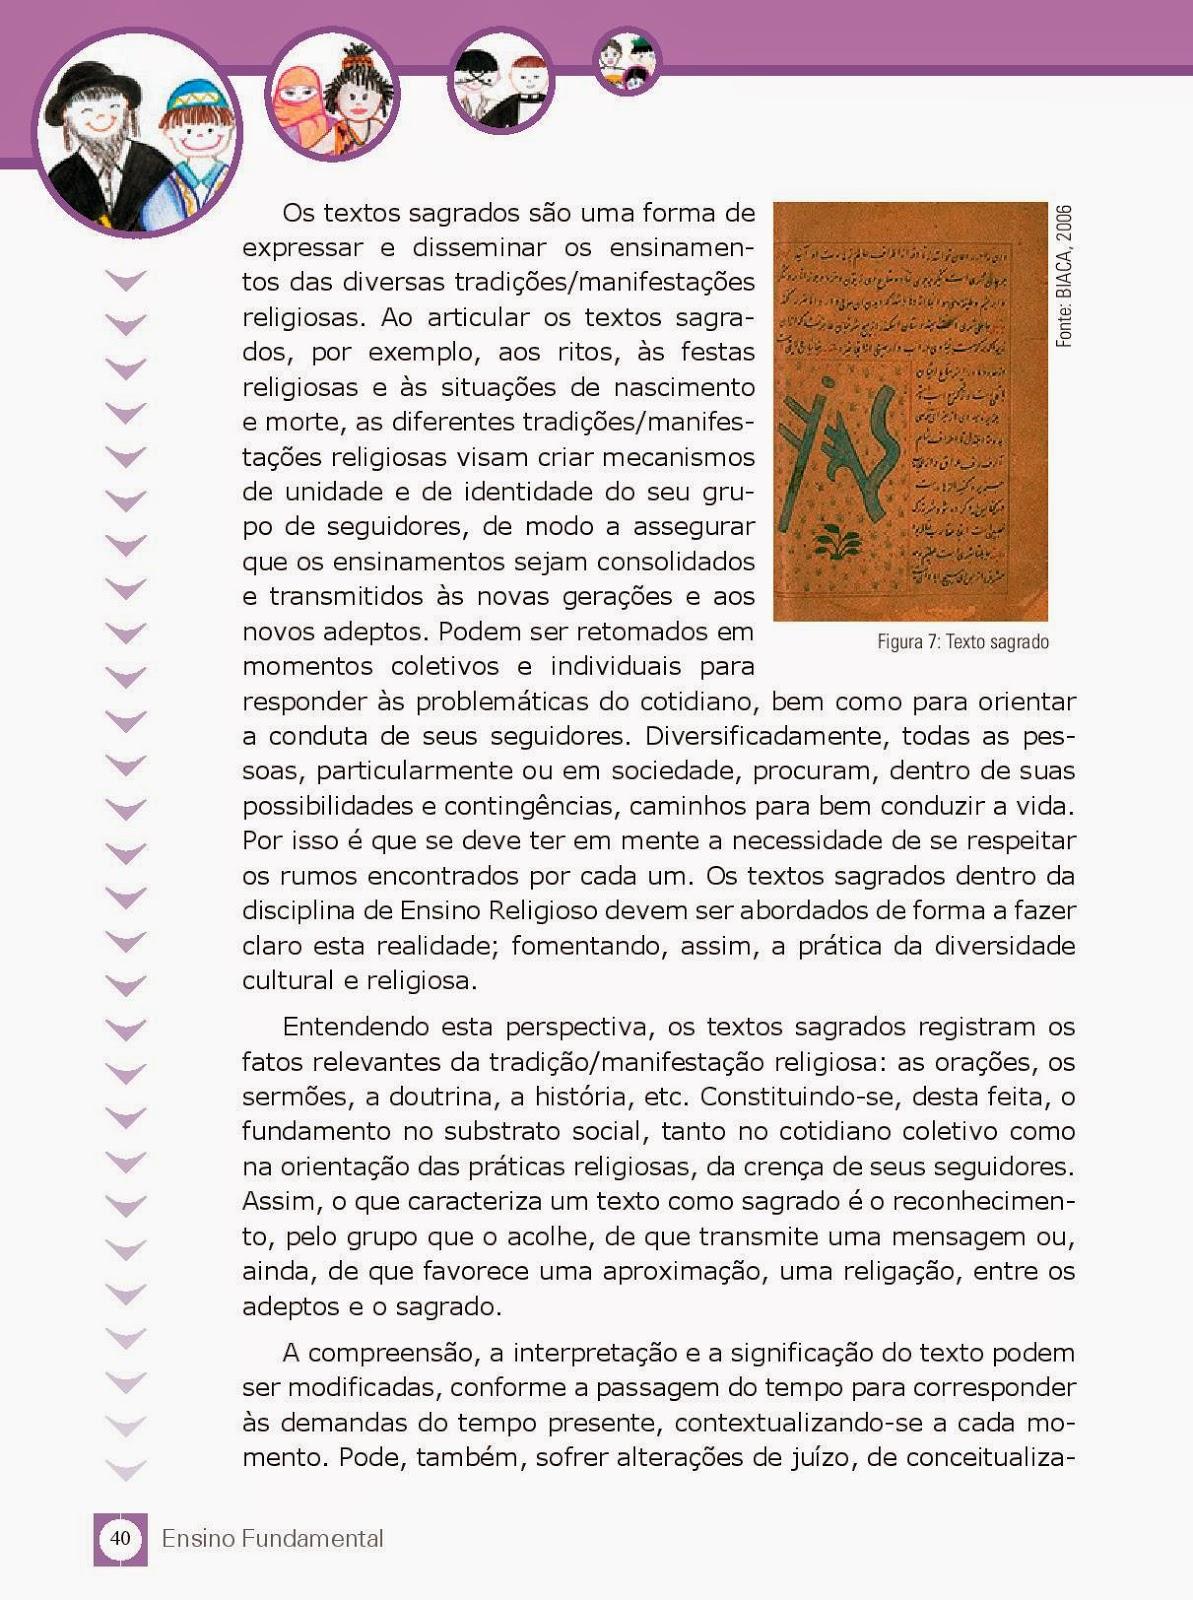 the seed nez marcelo pdf